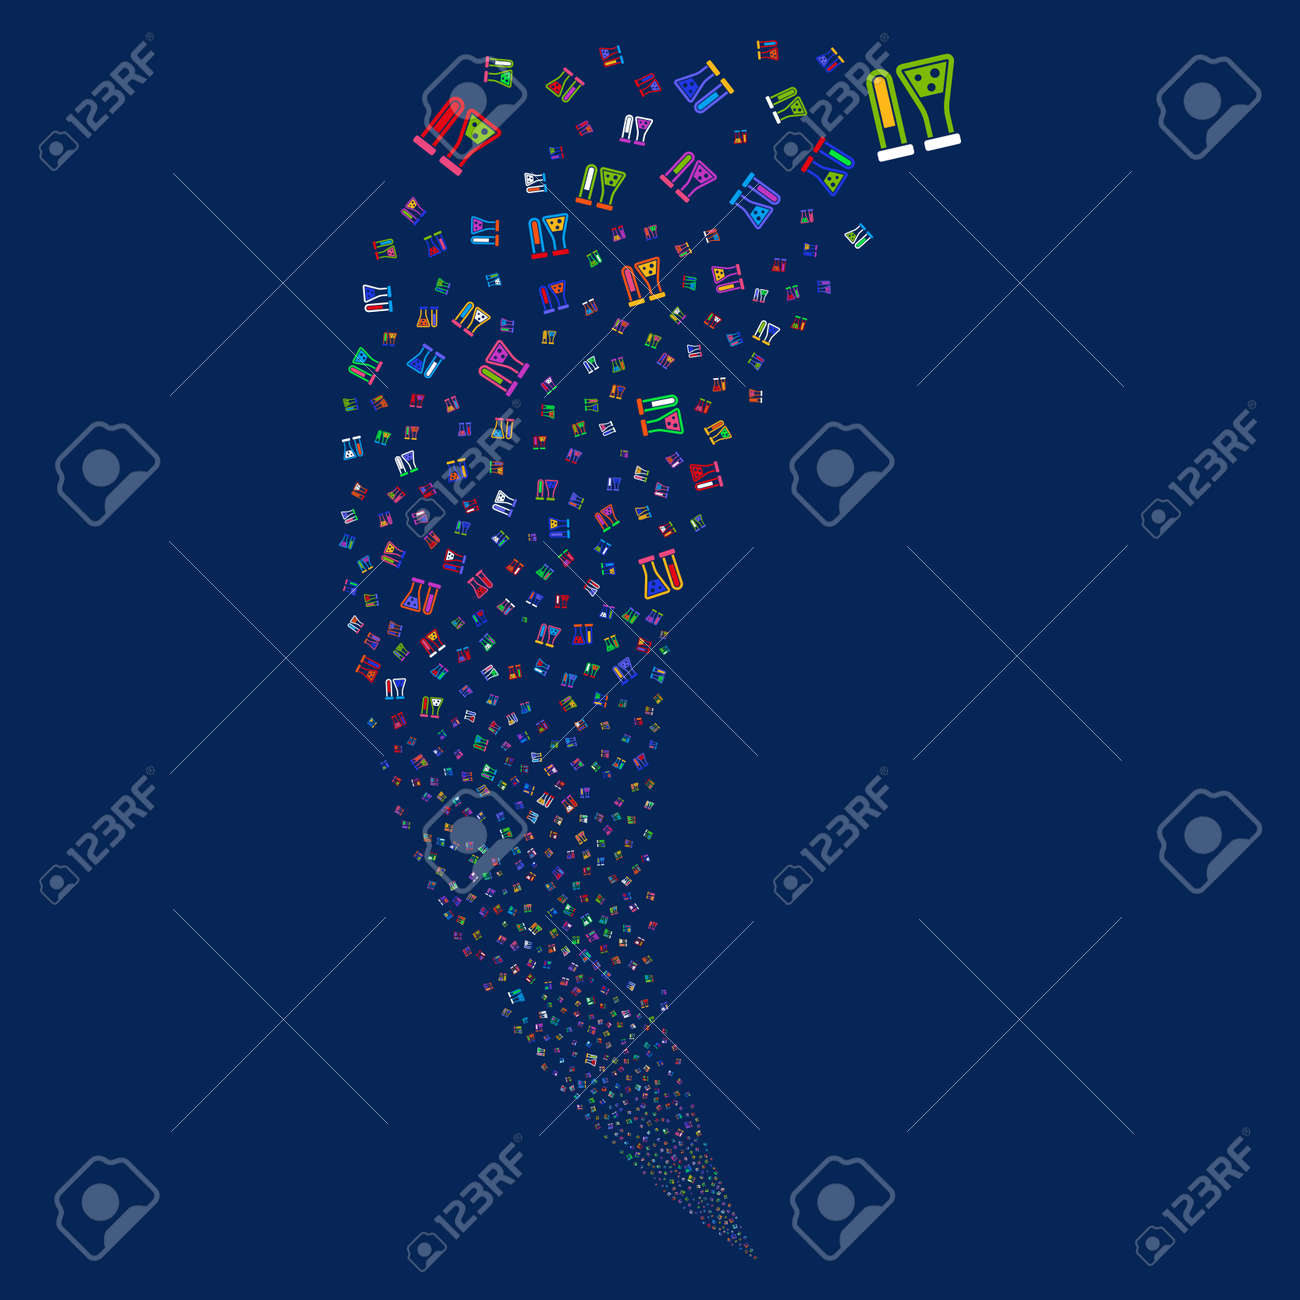 chemistry random fireworks stream  raster illustration style is flat bright  multicolored iconic symbols on a